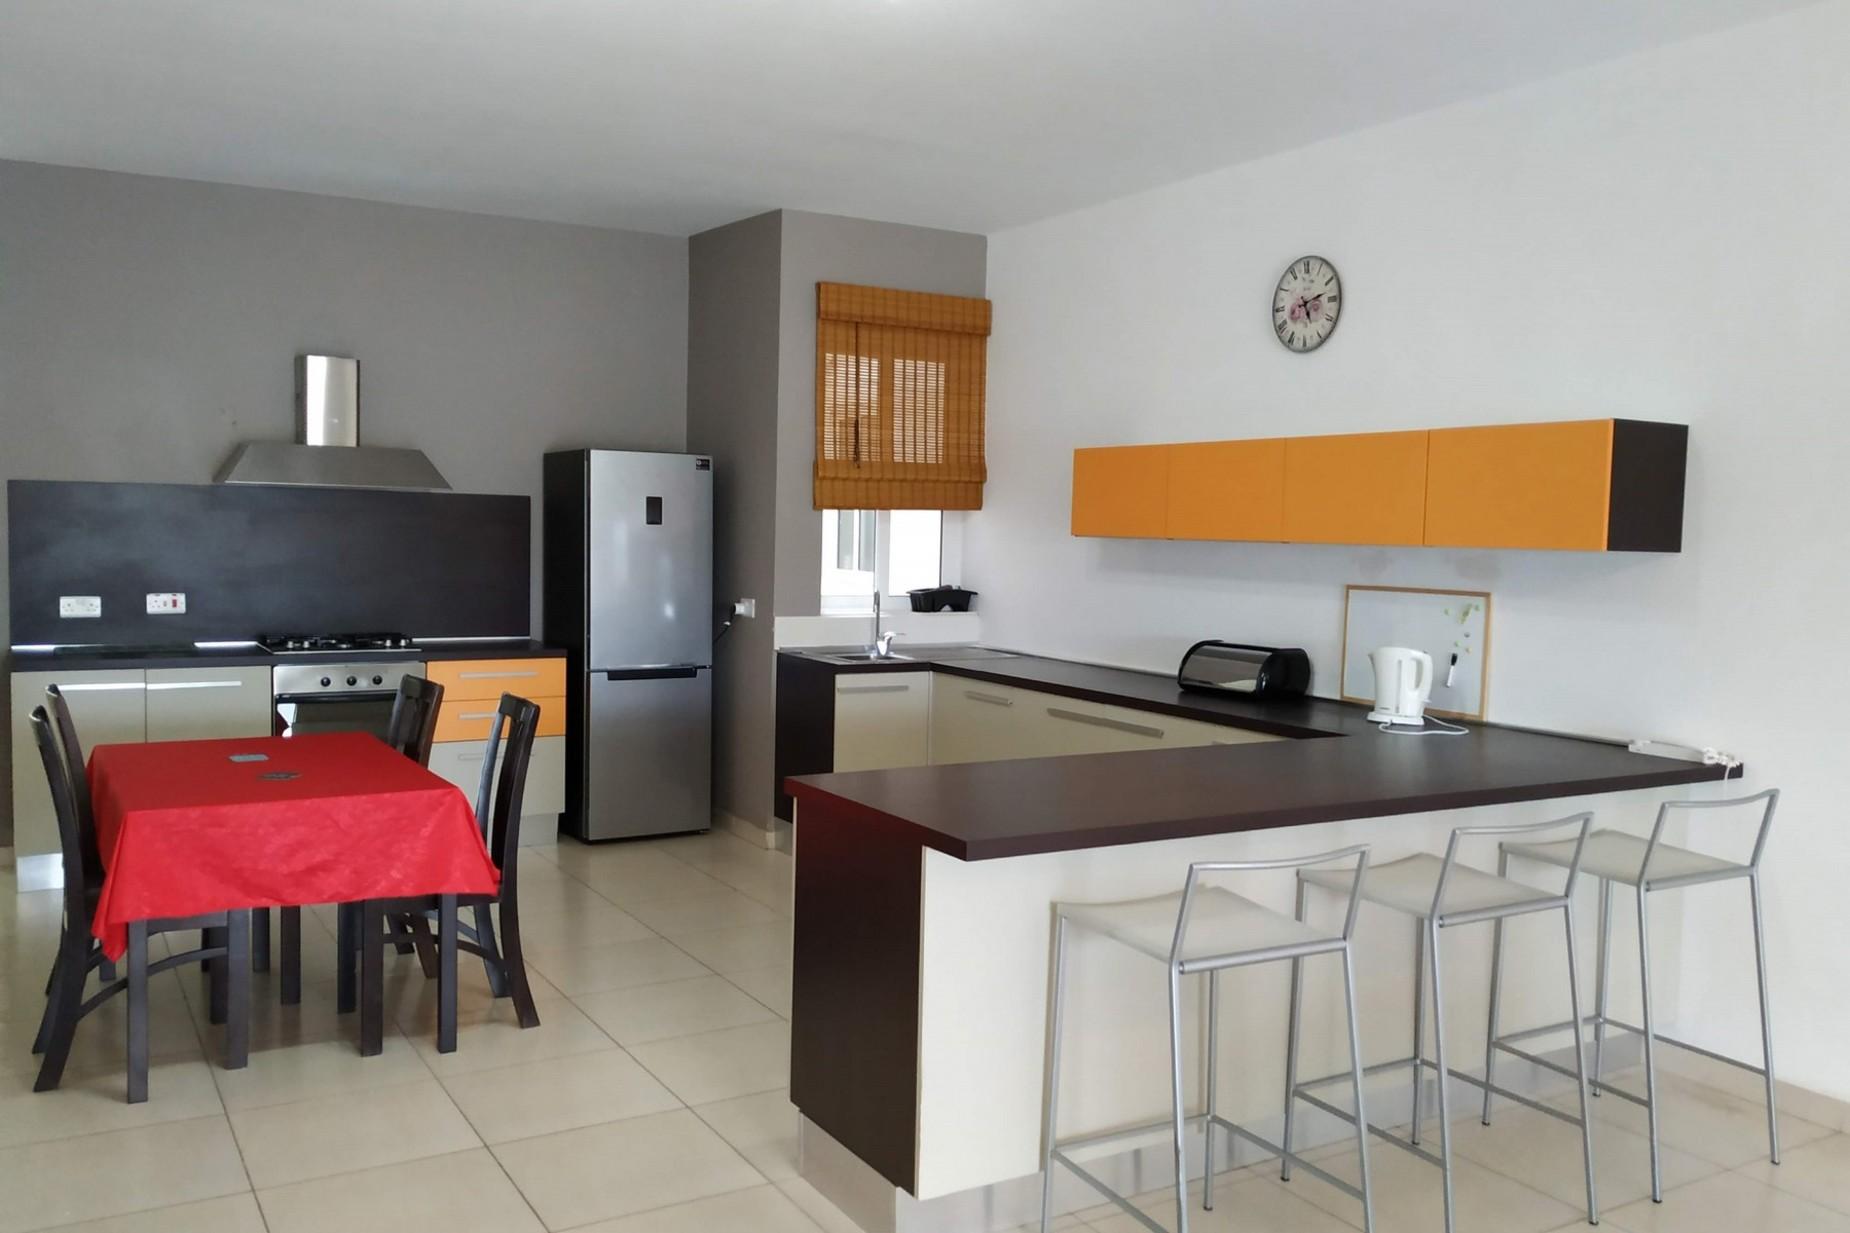 3 bed Apartment For Rent in Xemxija, Xemxija - thumb 6